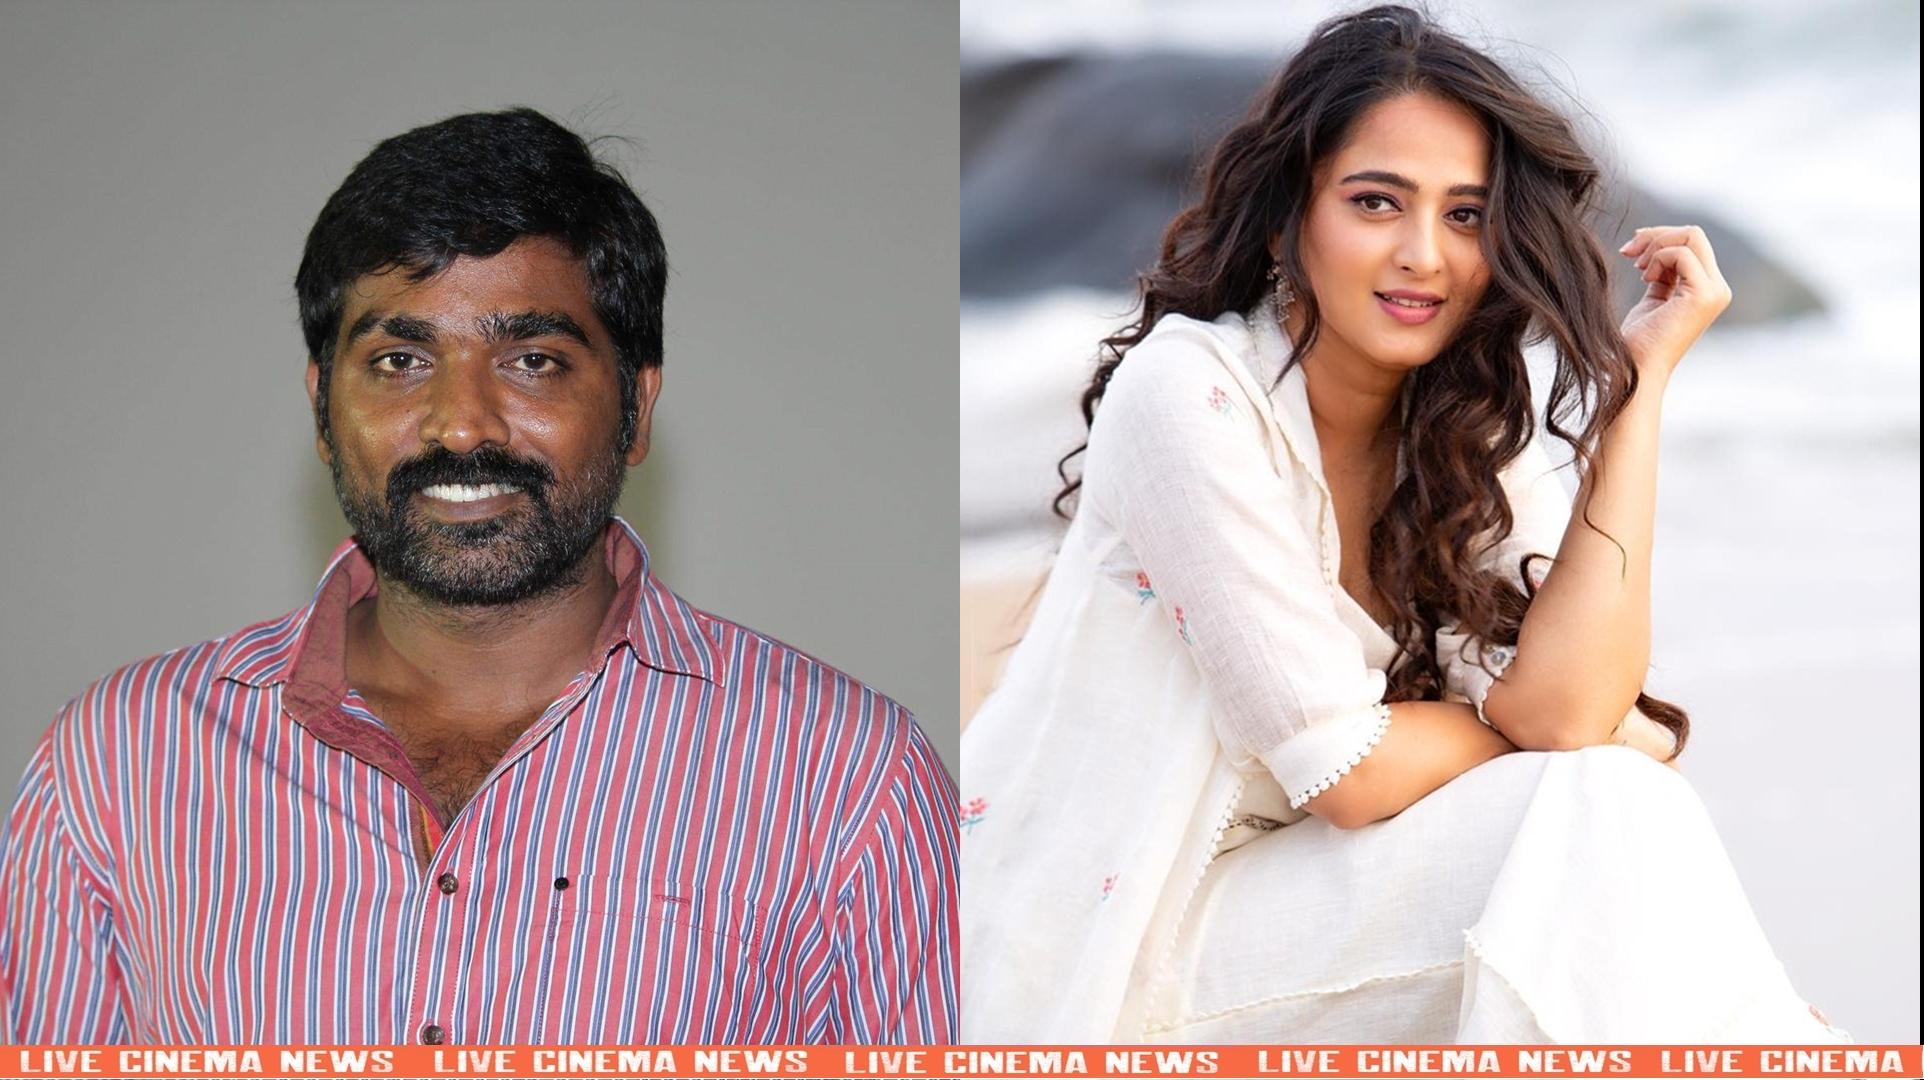 Anushka to pair with Vijay Sethupathi